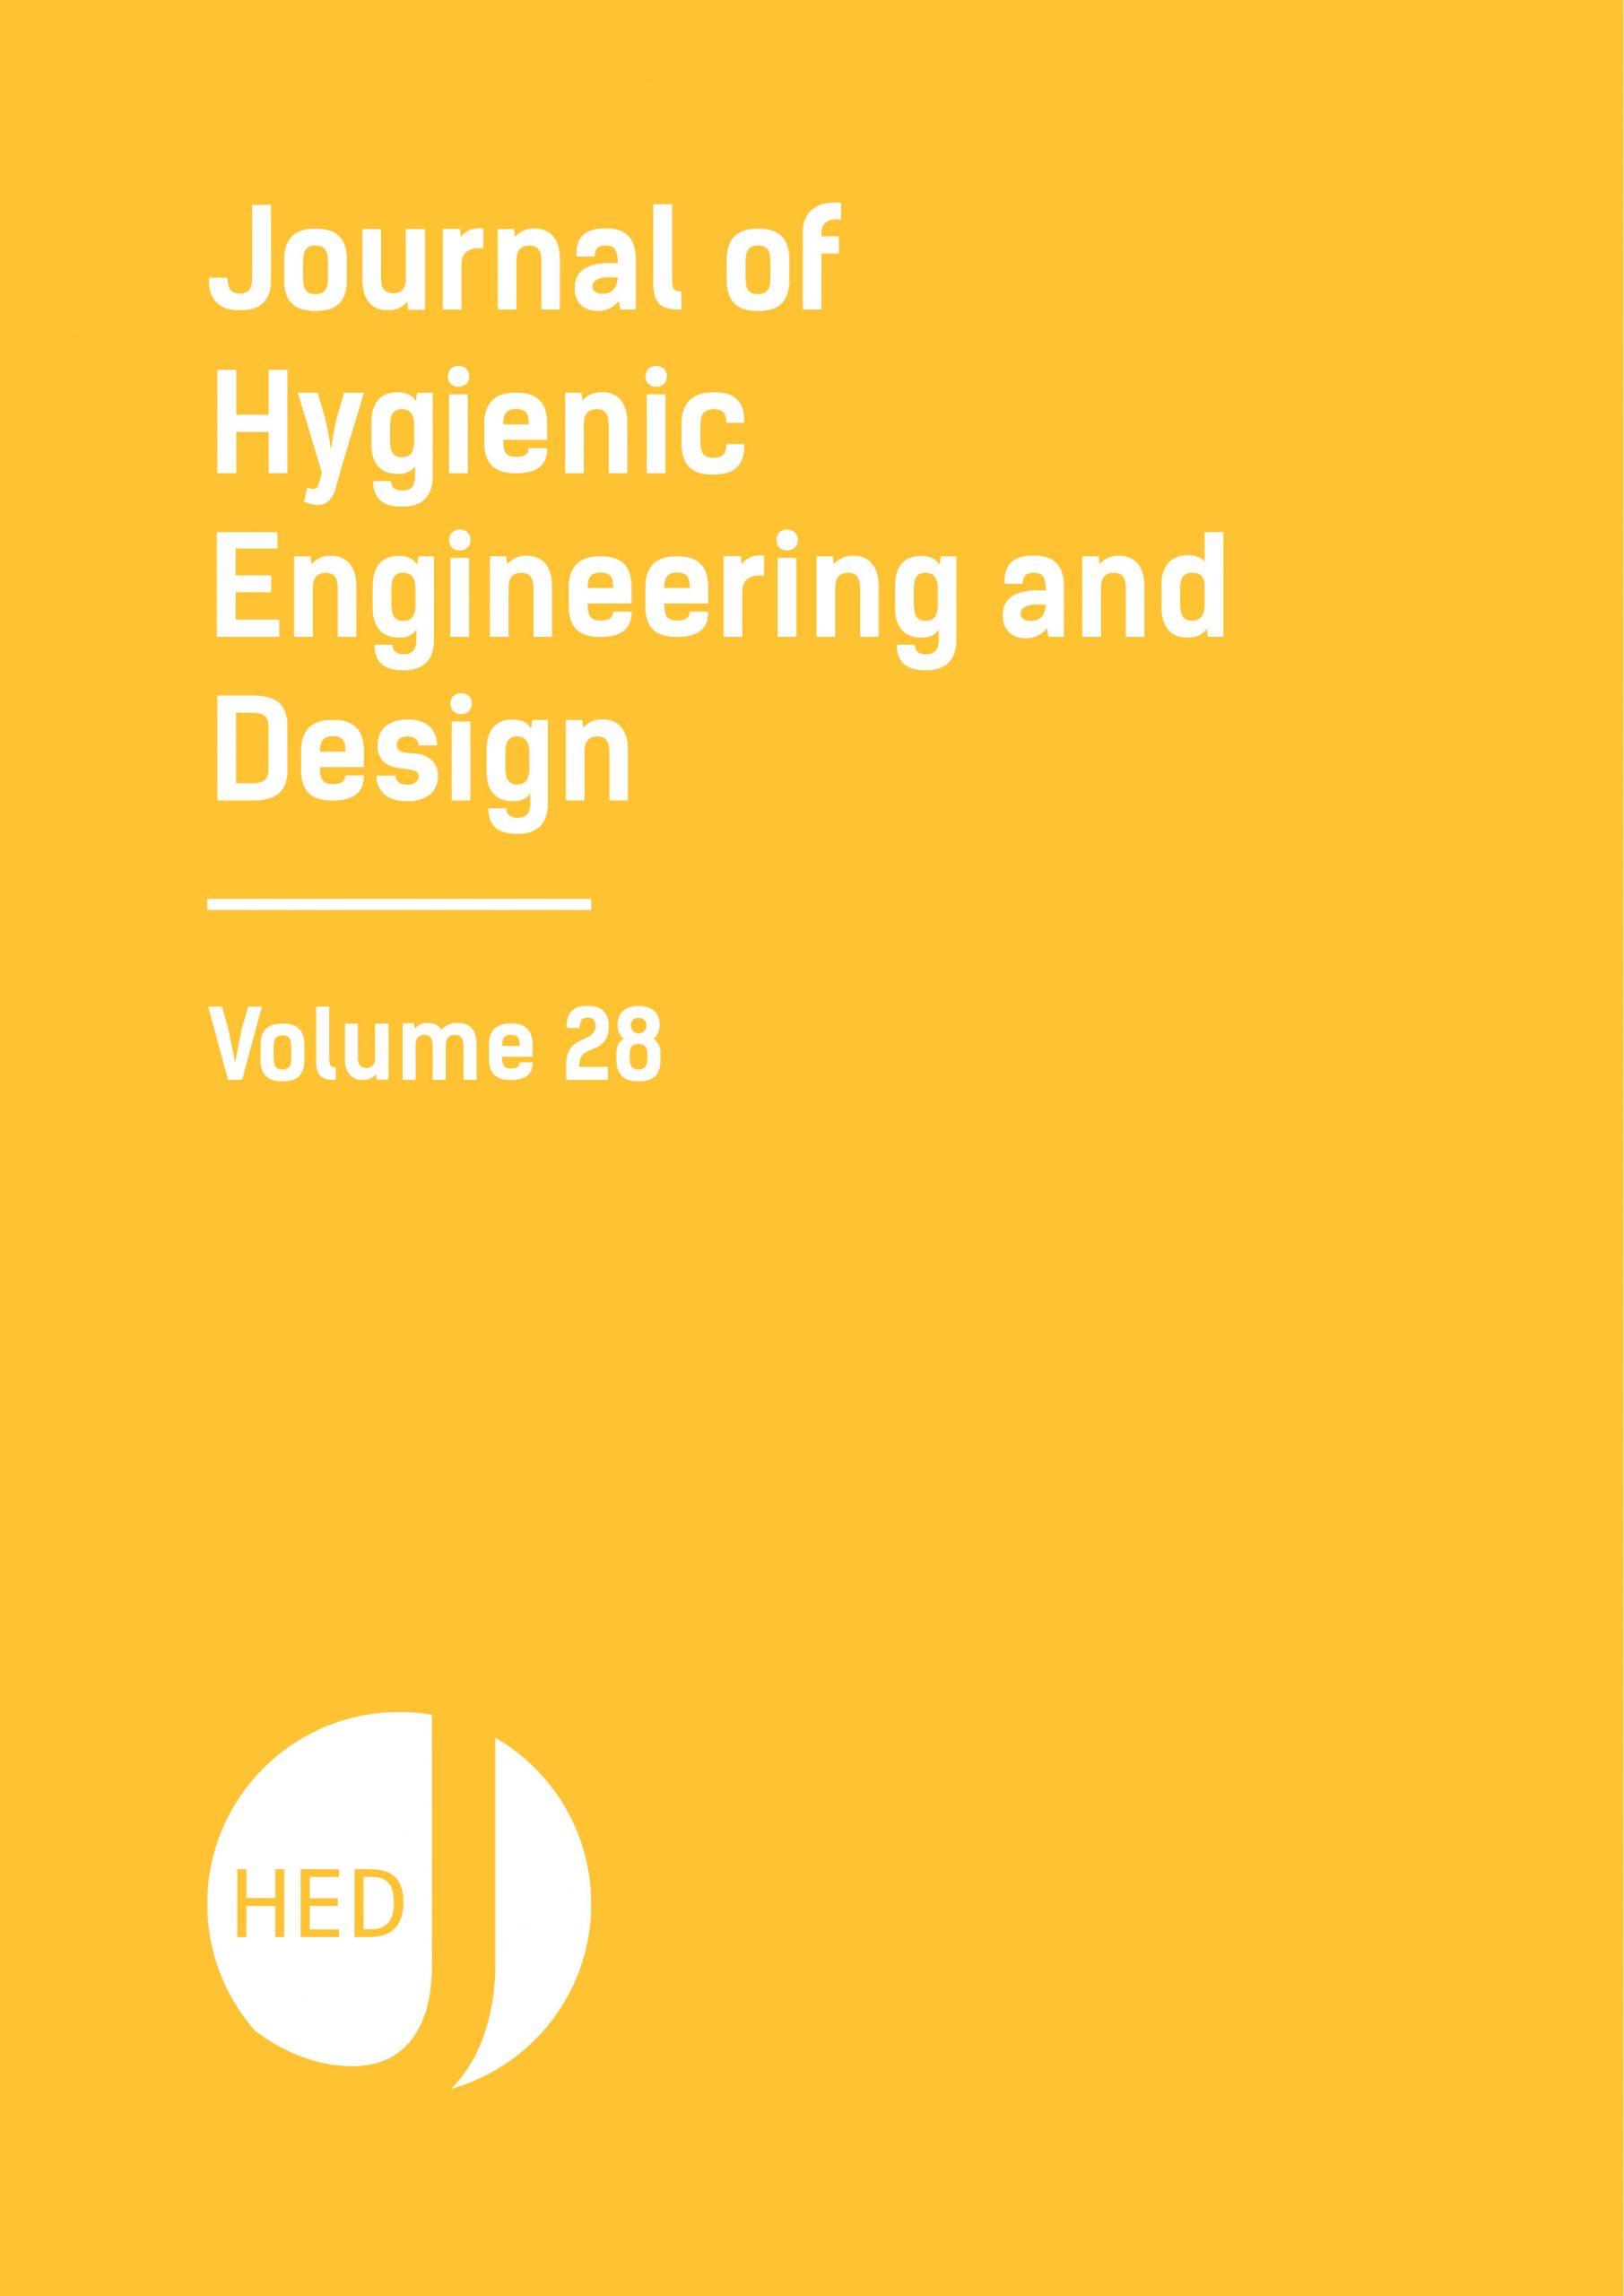 JHED Volume 28